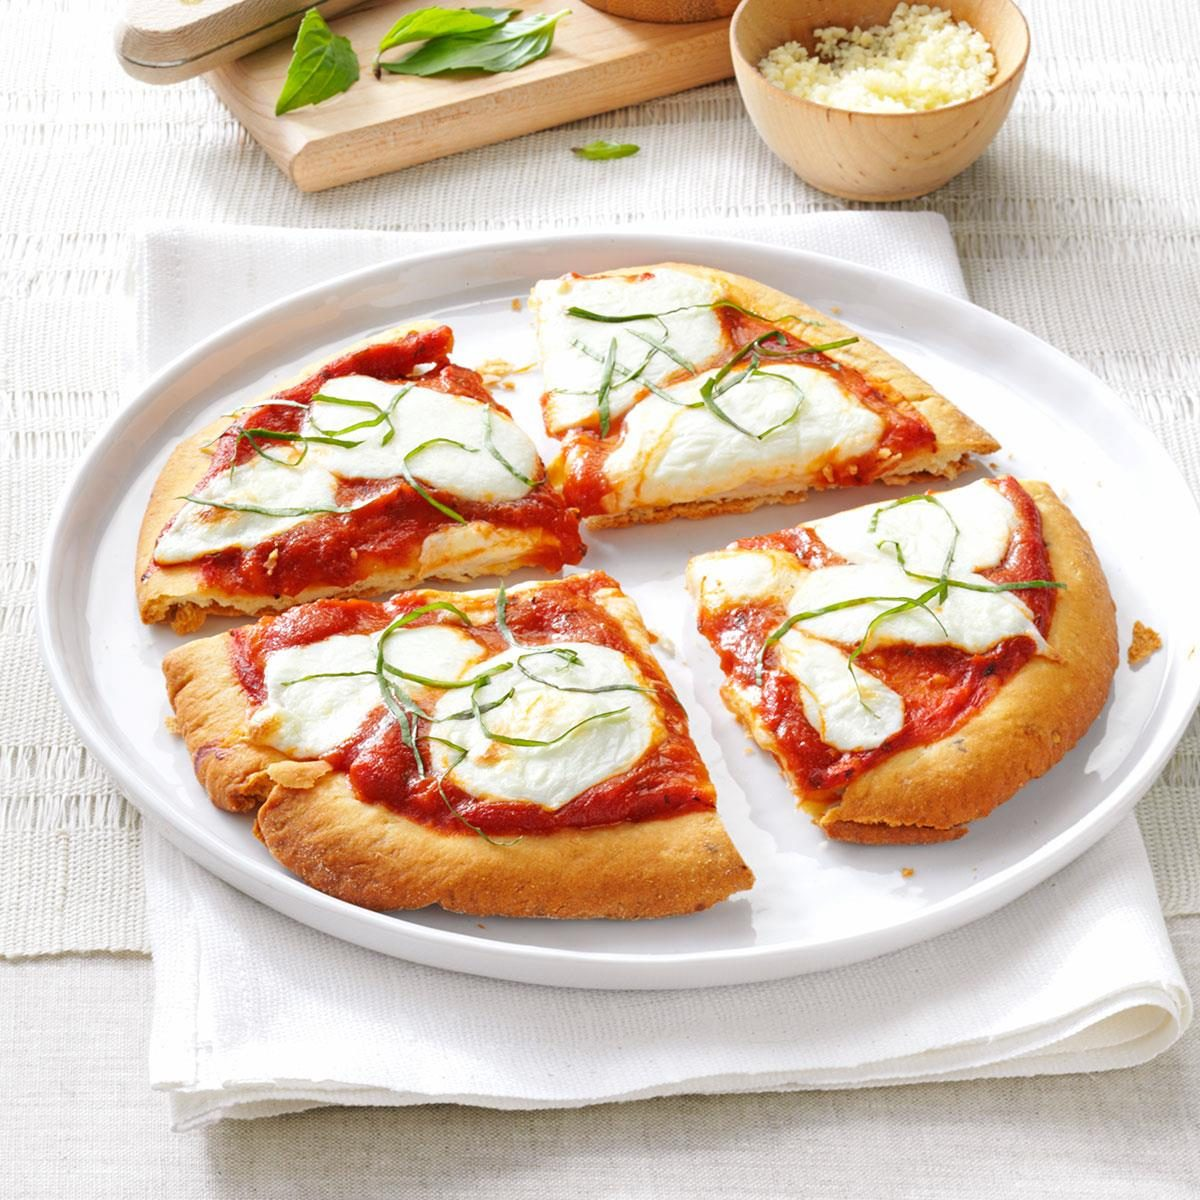 Personal margherita pizza